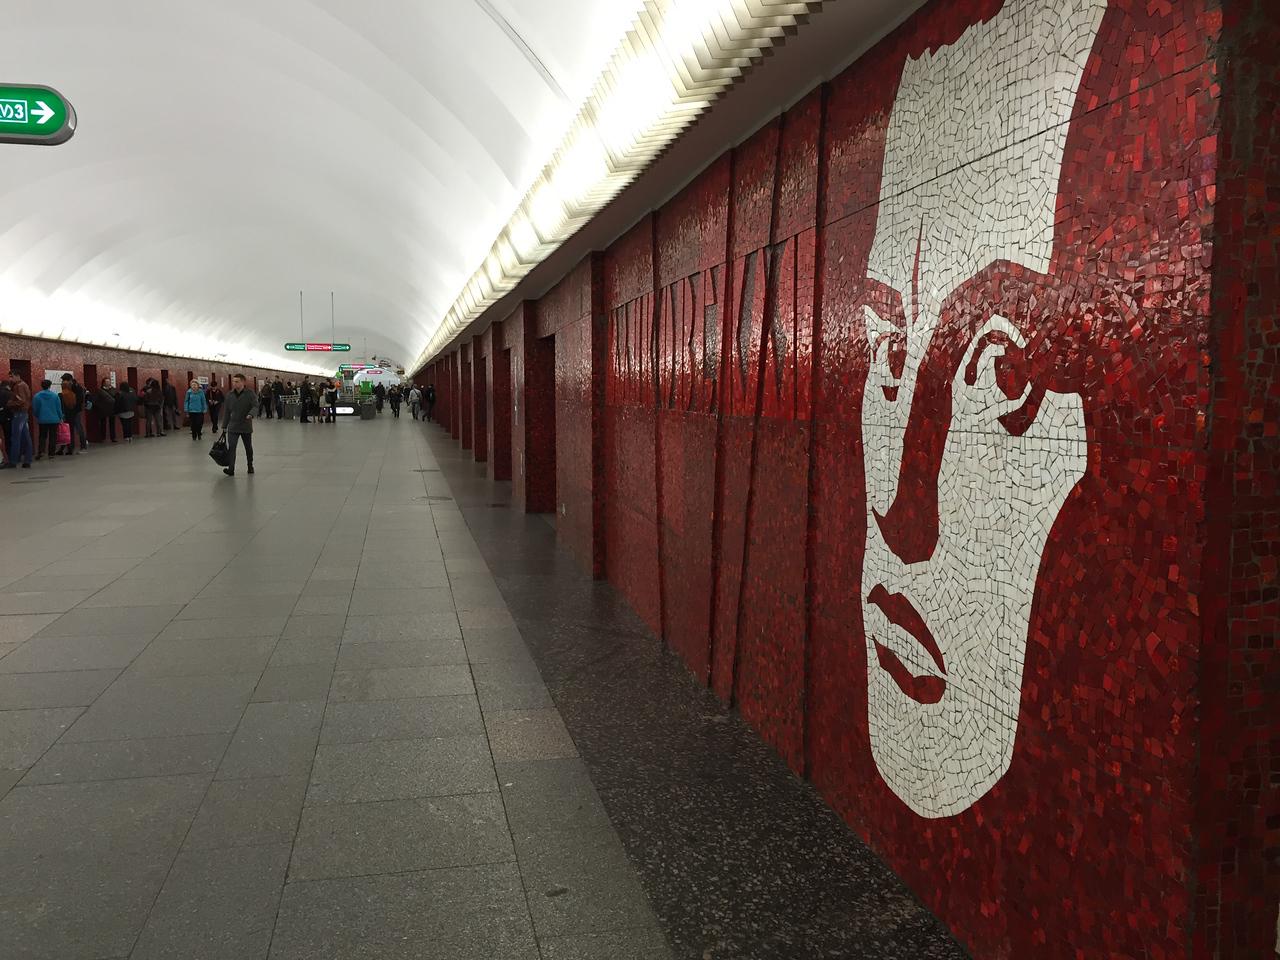 Inside the Metro